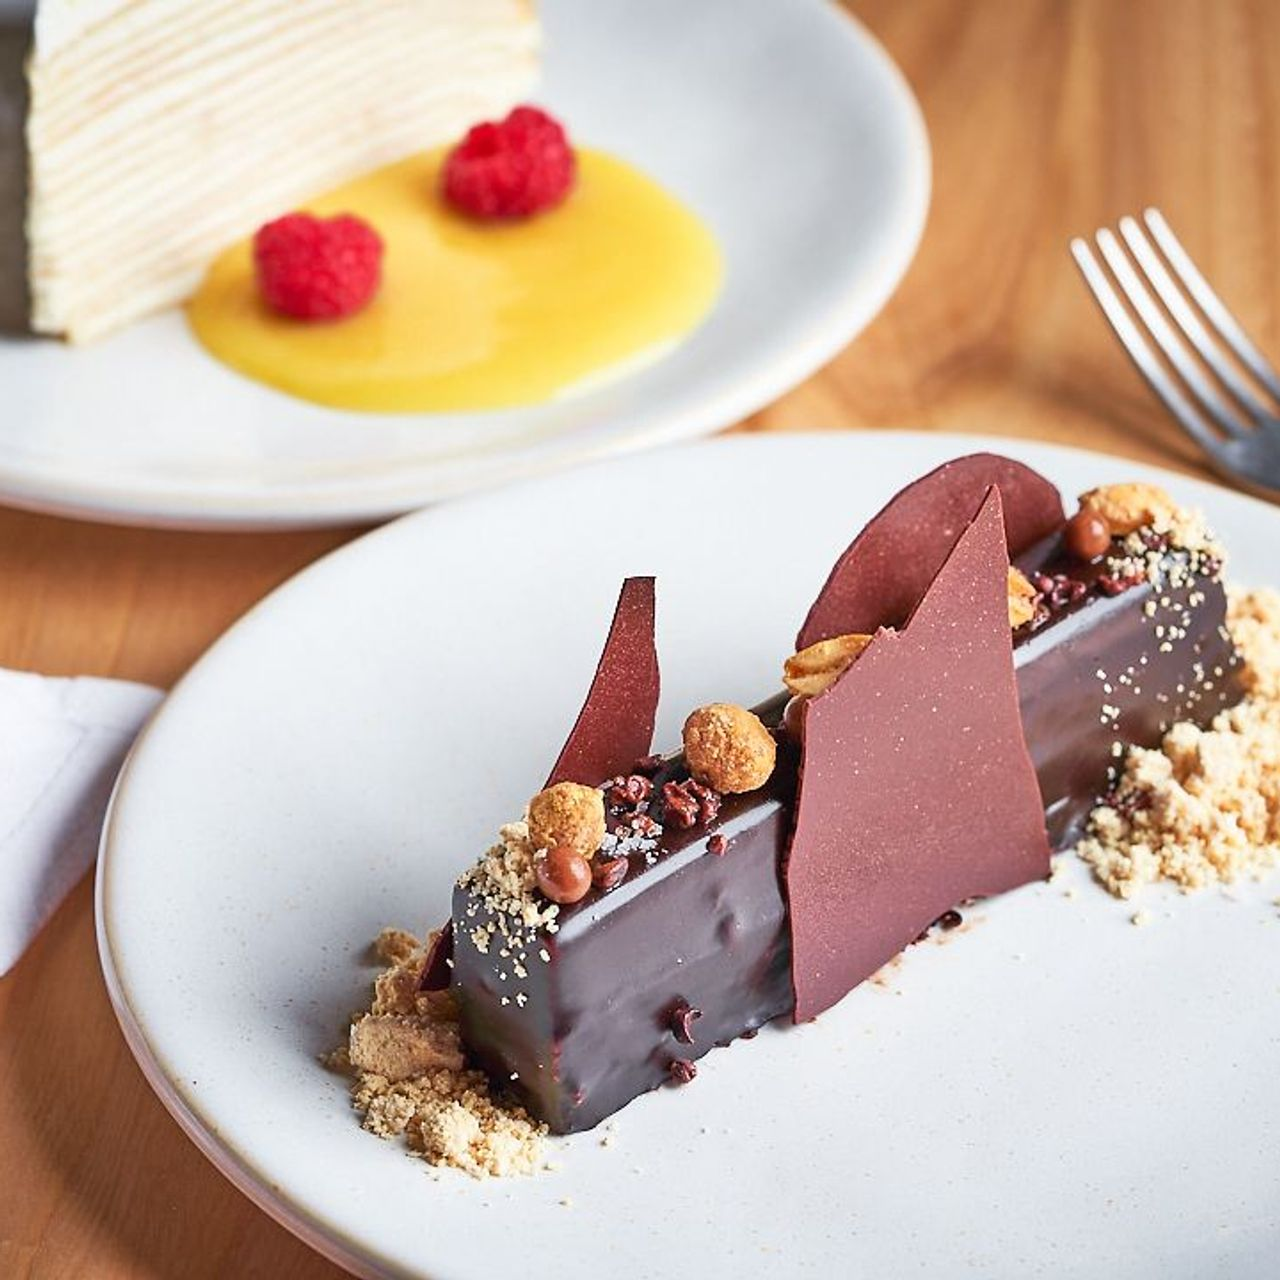 The Bungalow Kitchen Belmont Shore By Michael Mina Restaurant Long Beach Ca Opentable